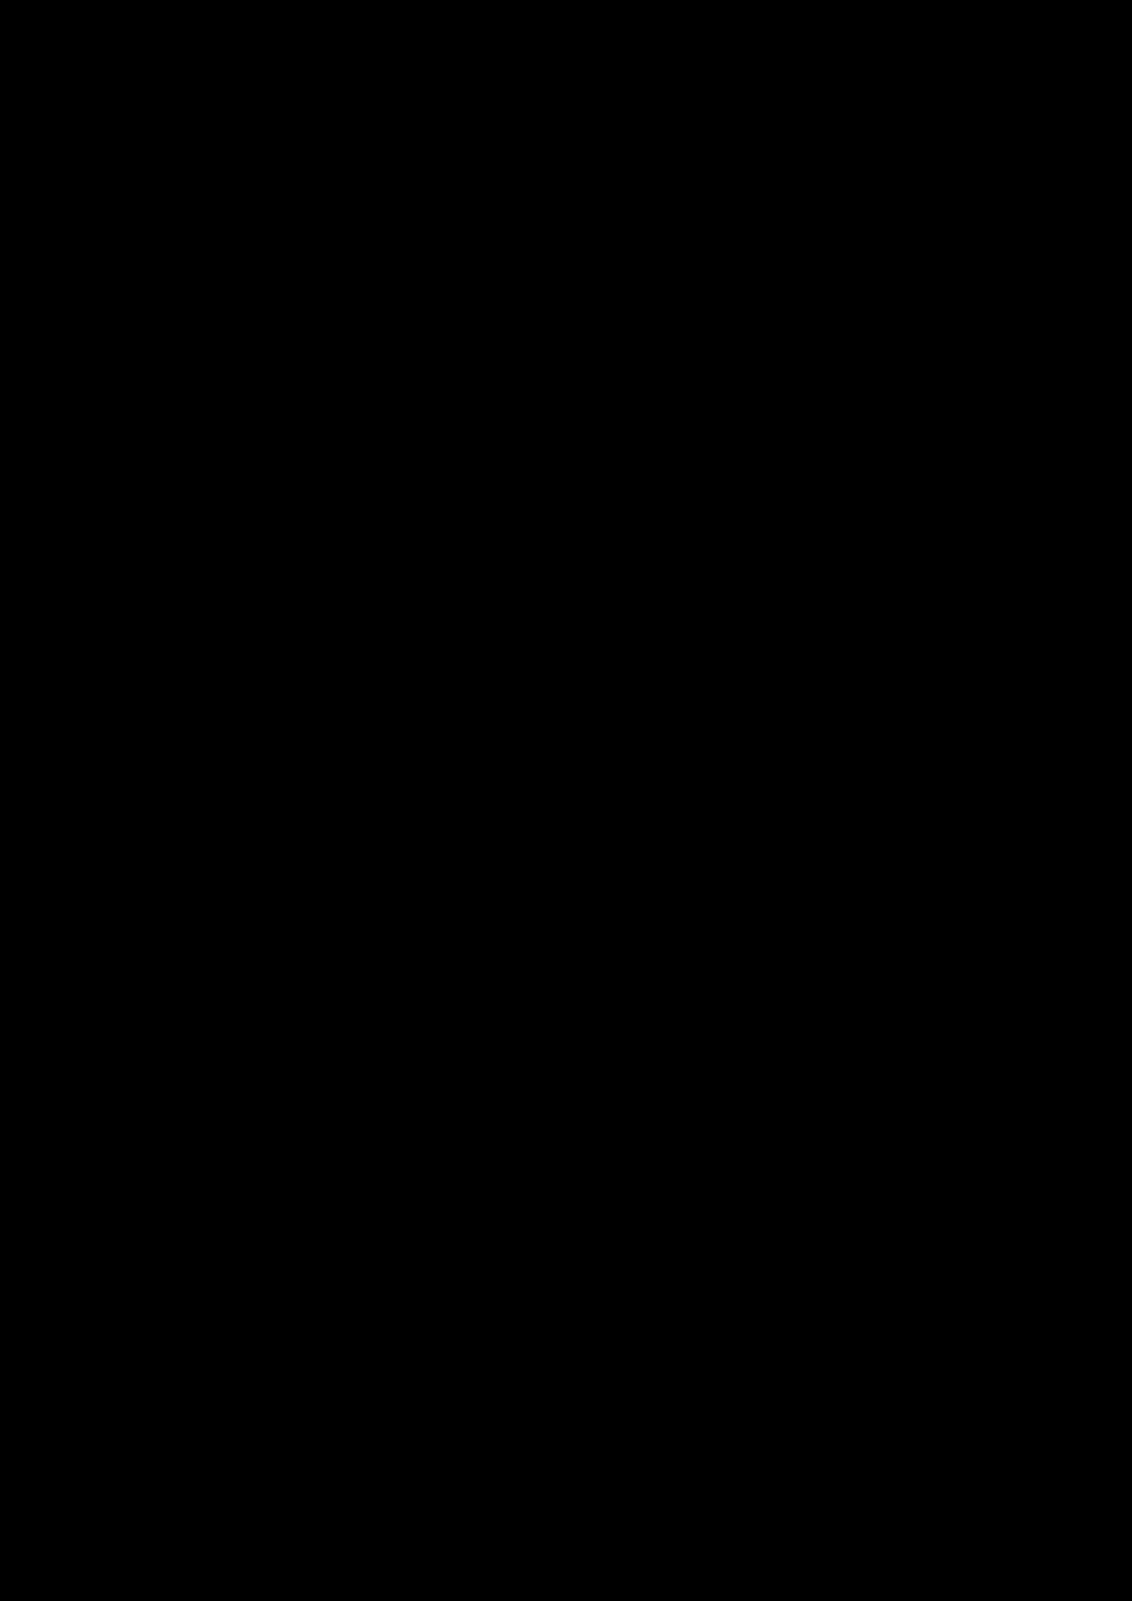 Korolevstvo slez slide, Image 56